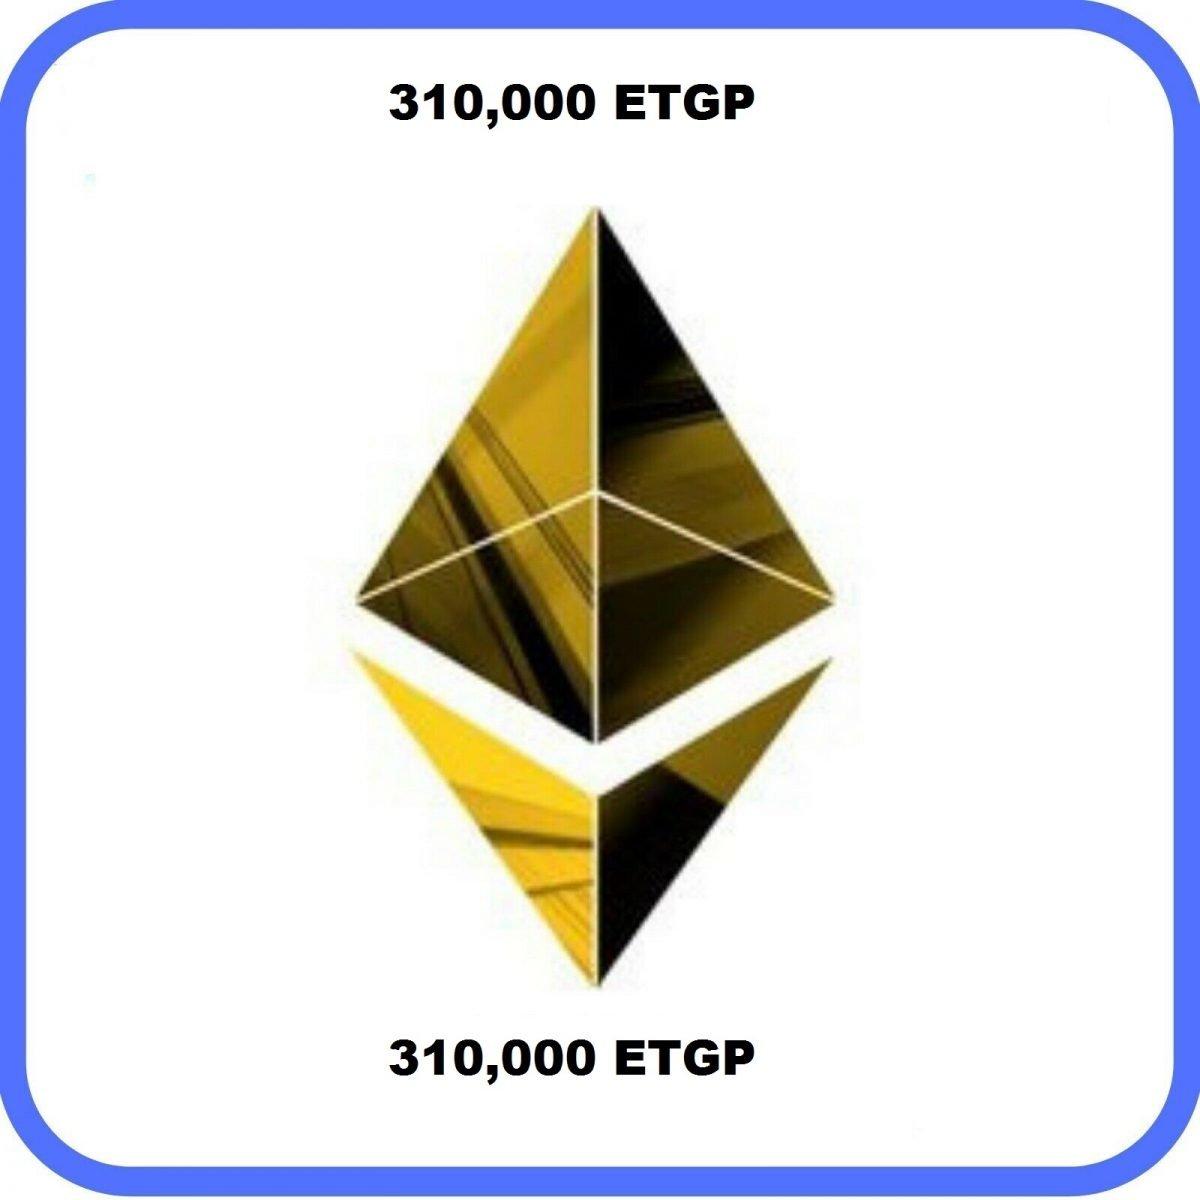 Etgp project (310000)